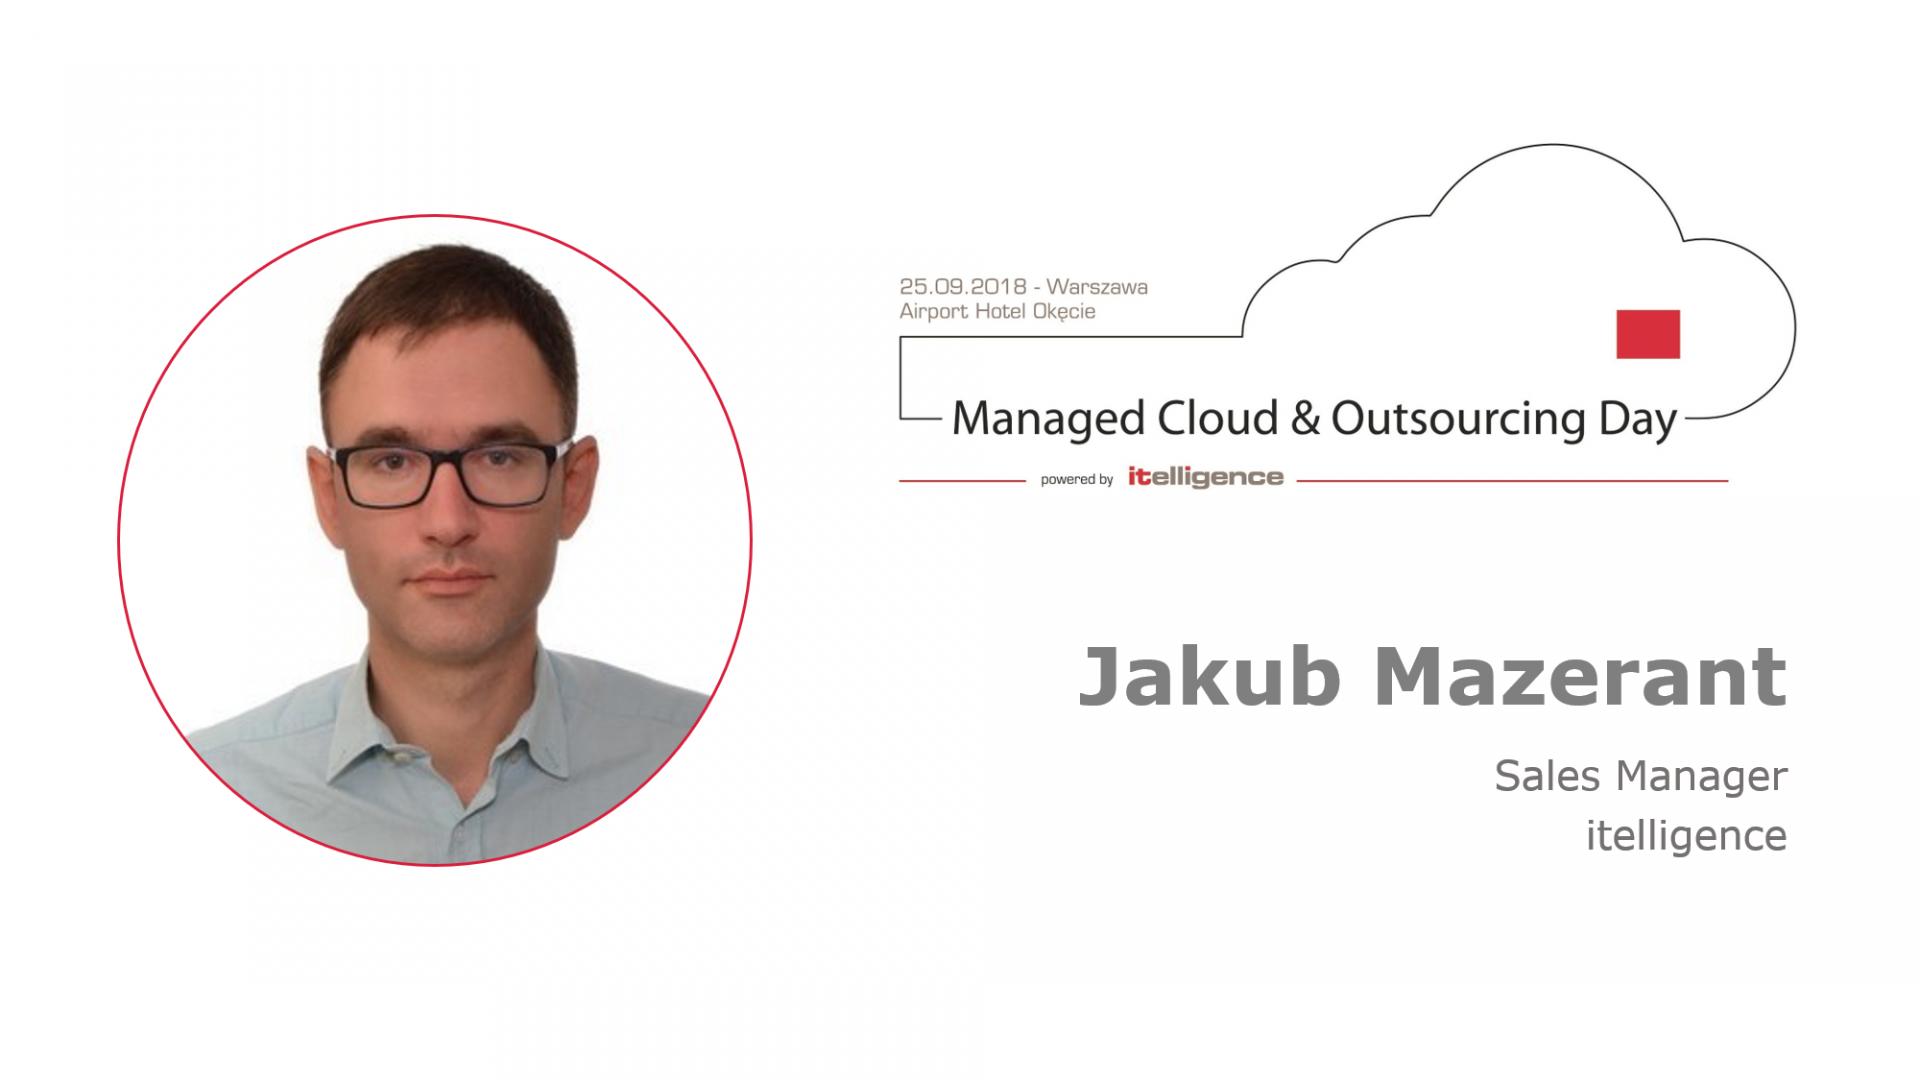 Business case PEPCO - Jakub Mazerant